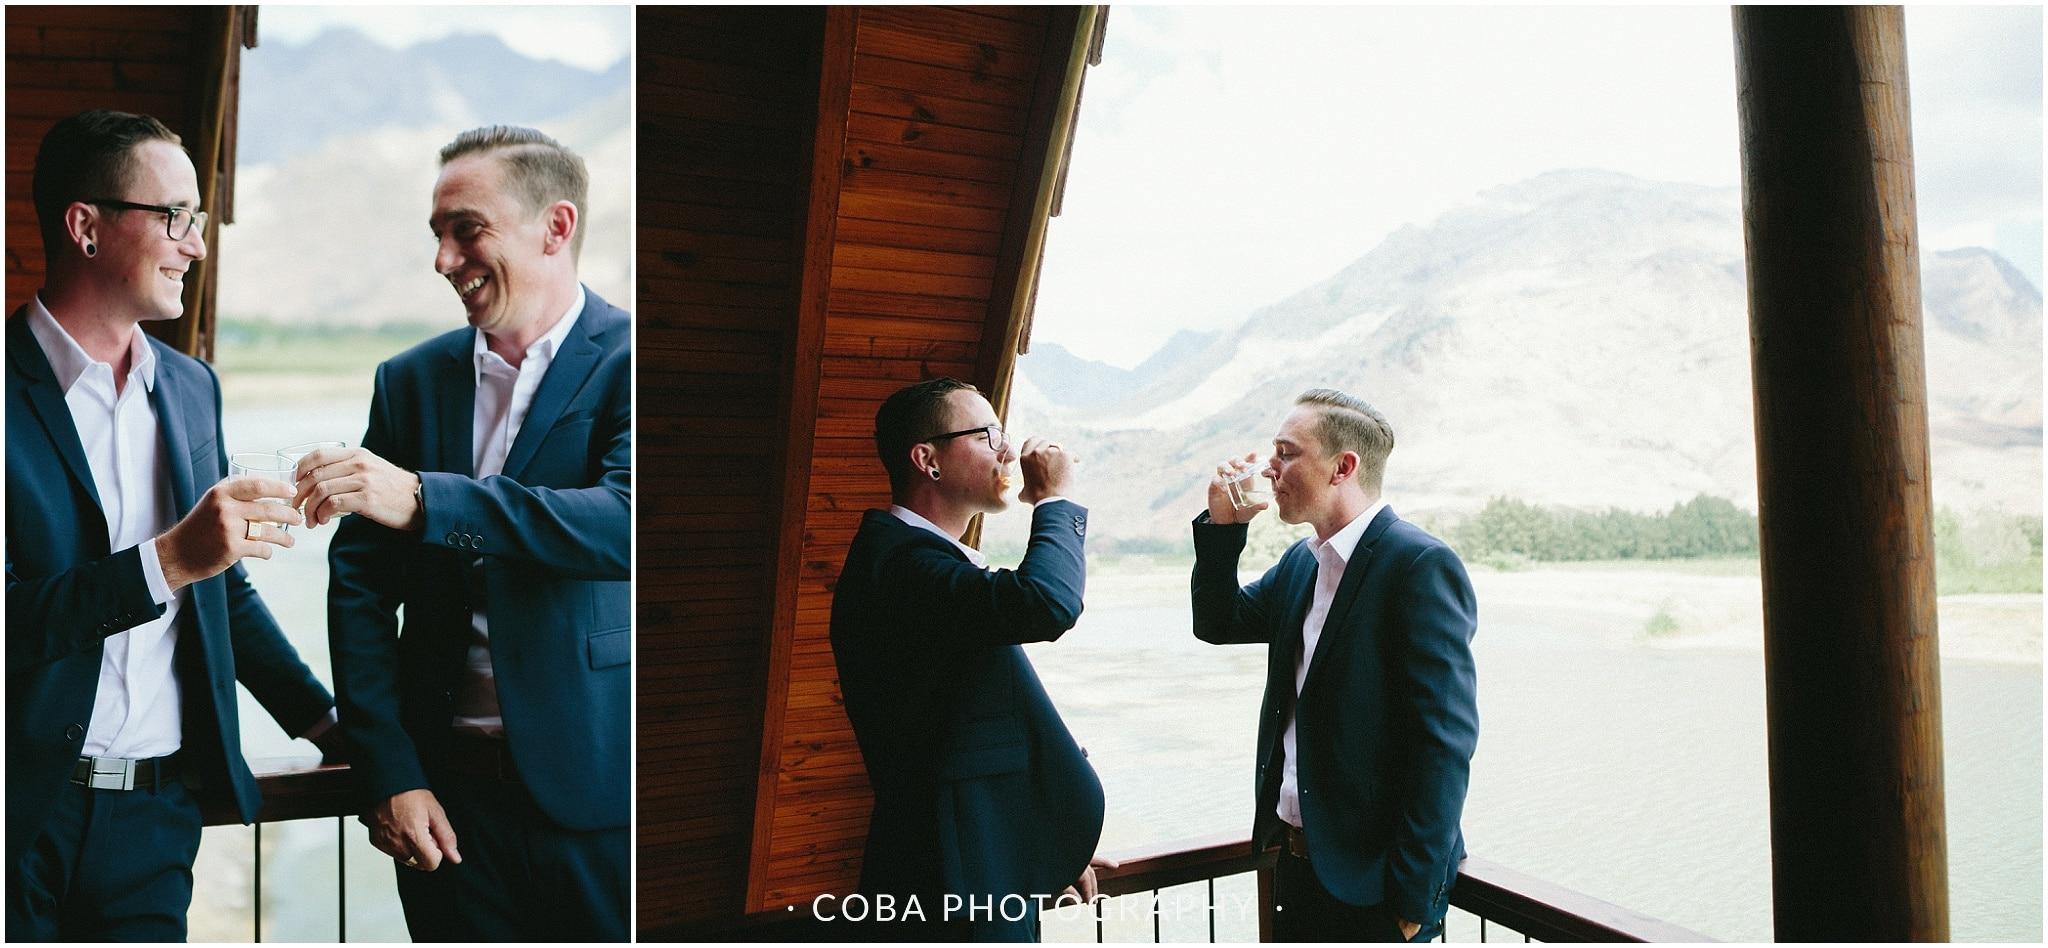 John&Pad - Olive Rock - Coba Photography (41)